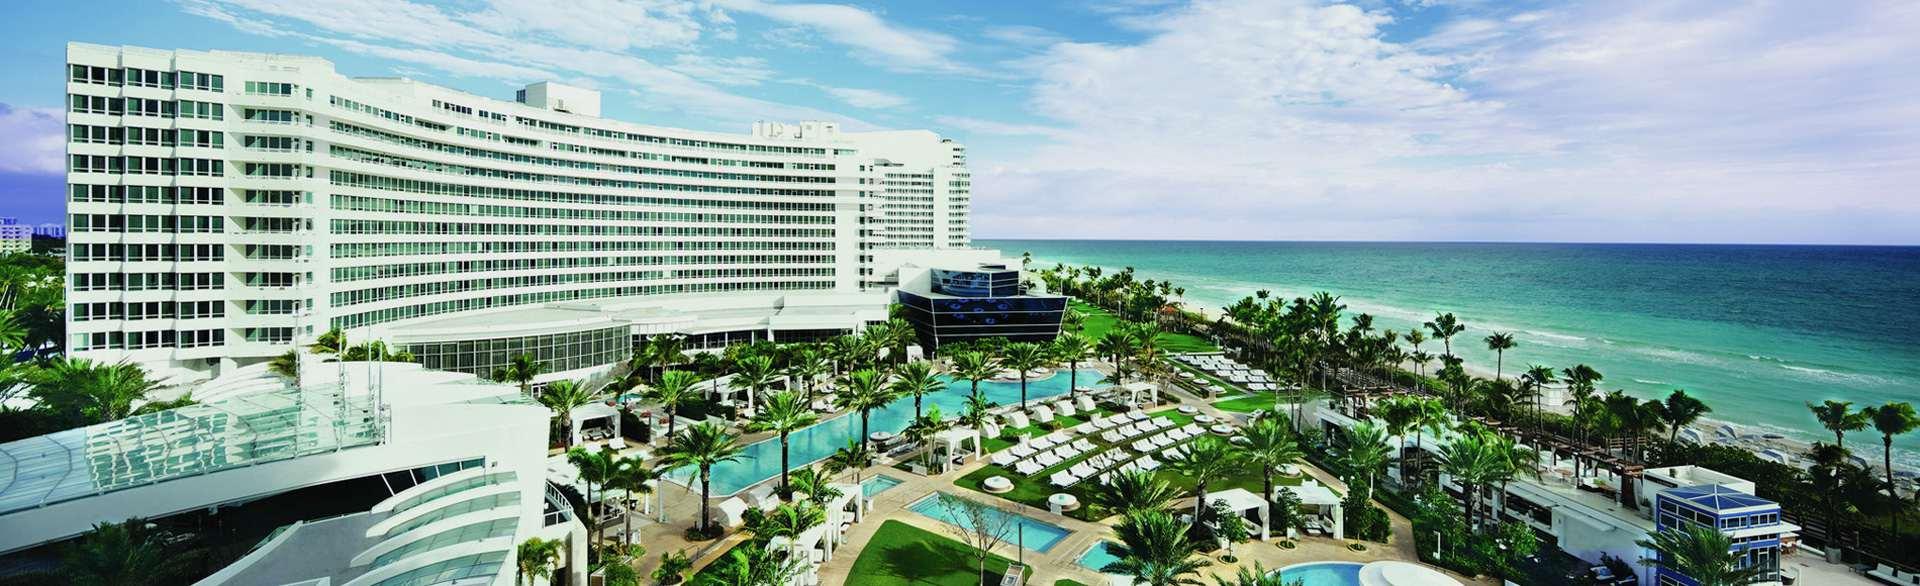 hotel_fontainebleu